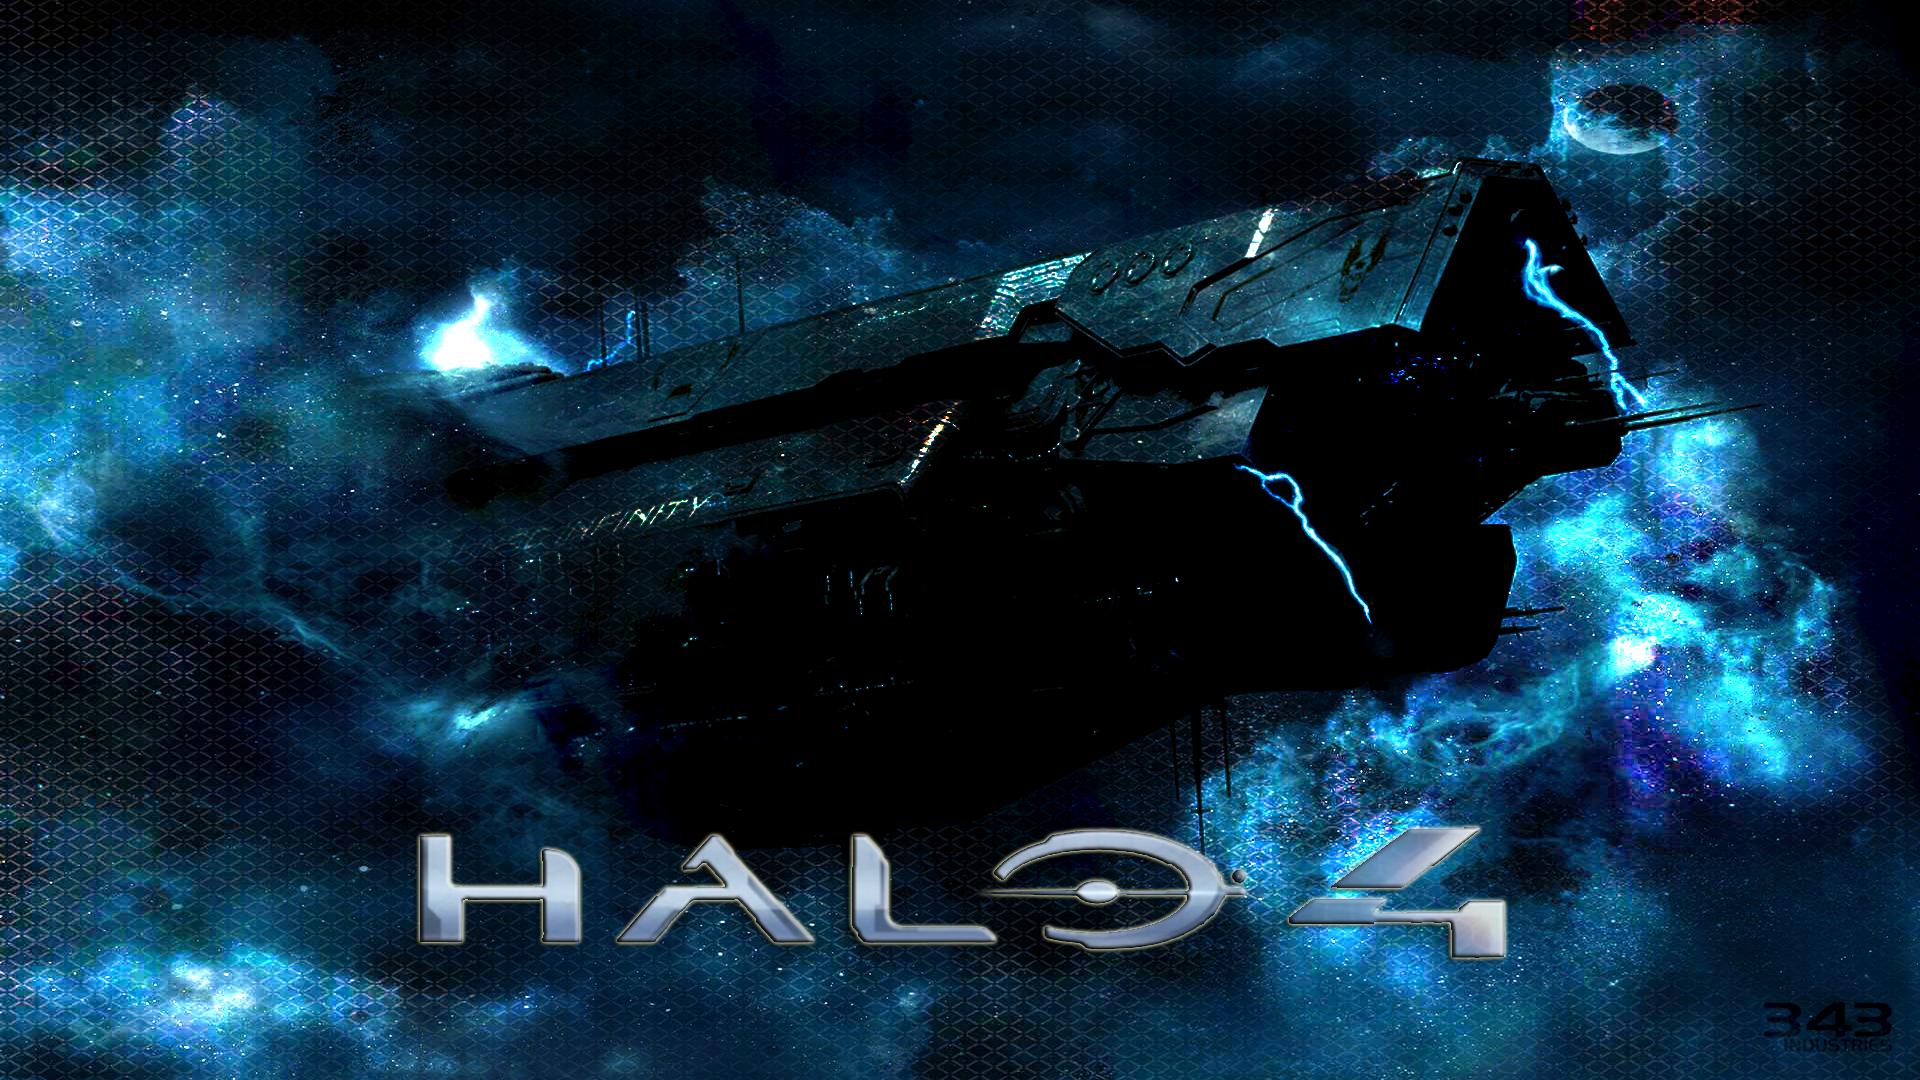 Halo 4 Wallpaper visit yuiphone 4 more Halo 4 Campaign 5 1920x1080 1920x1080